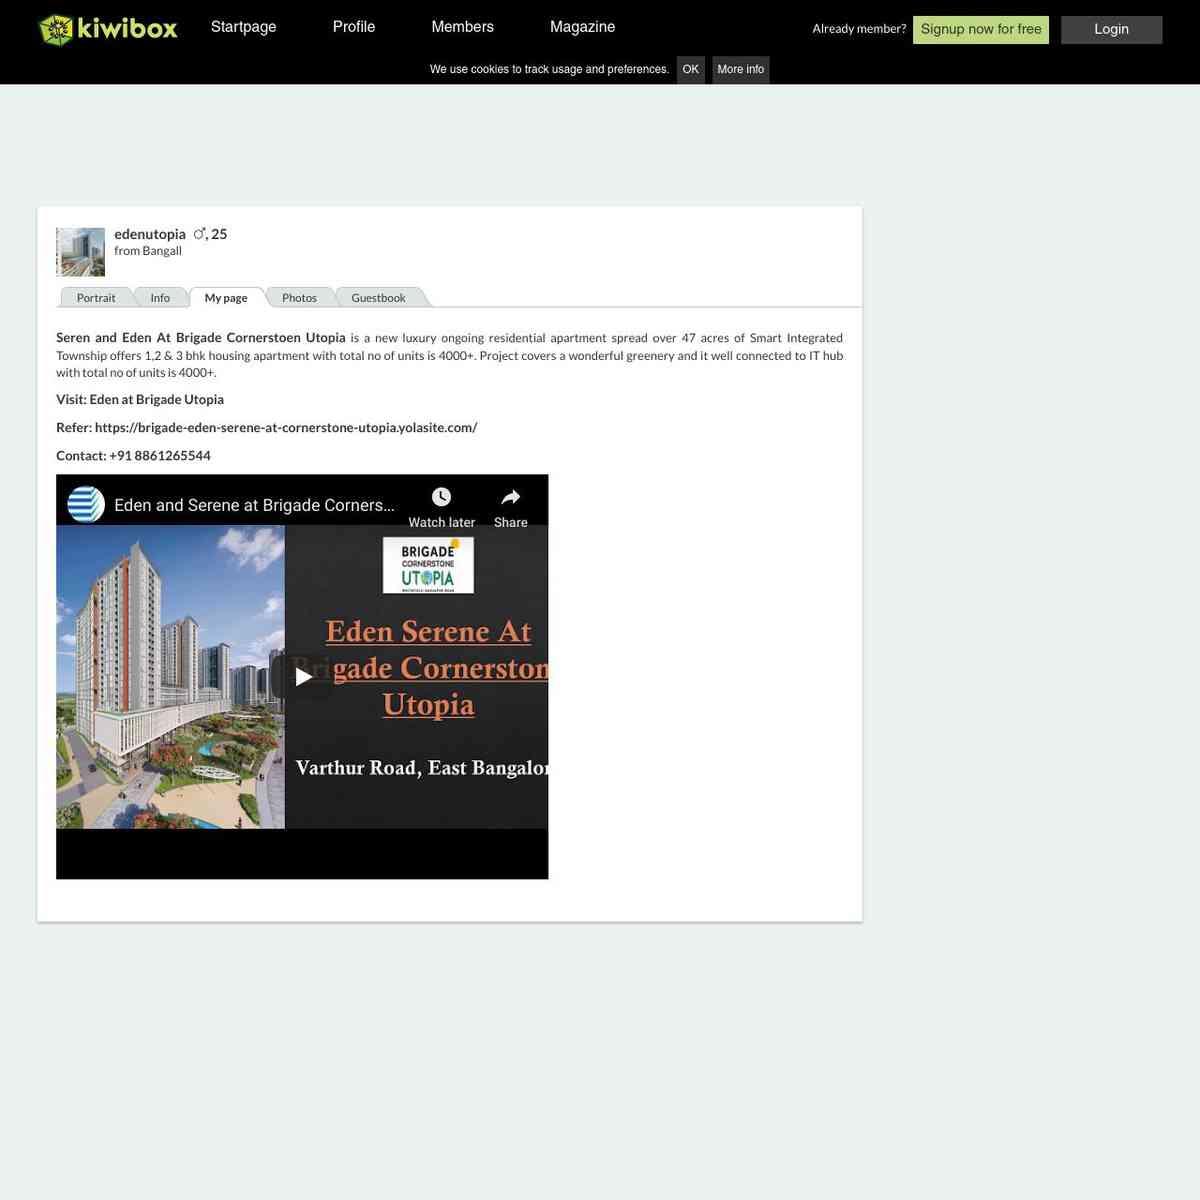 kiwibox.com/edenutopia/mypage/